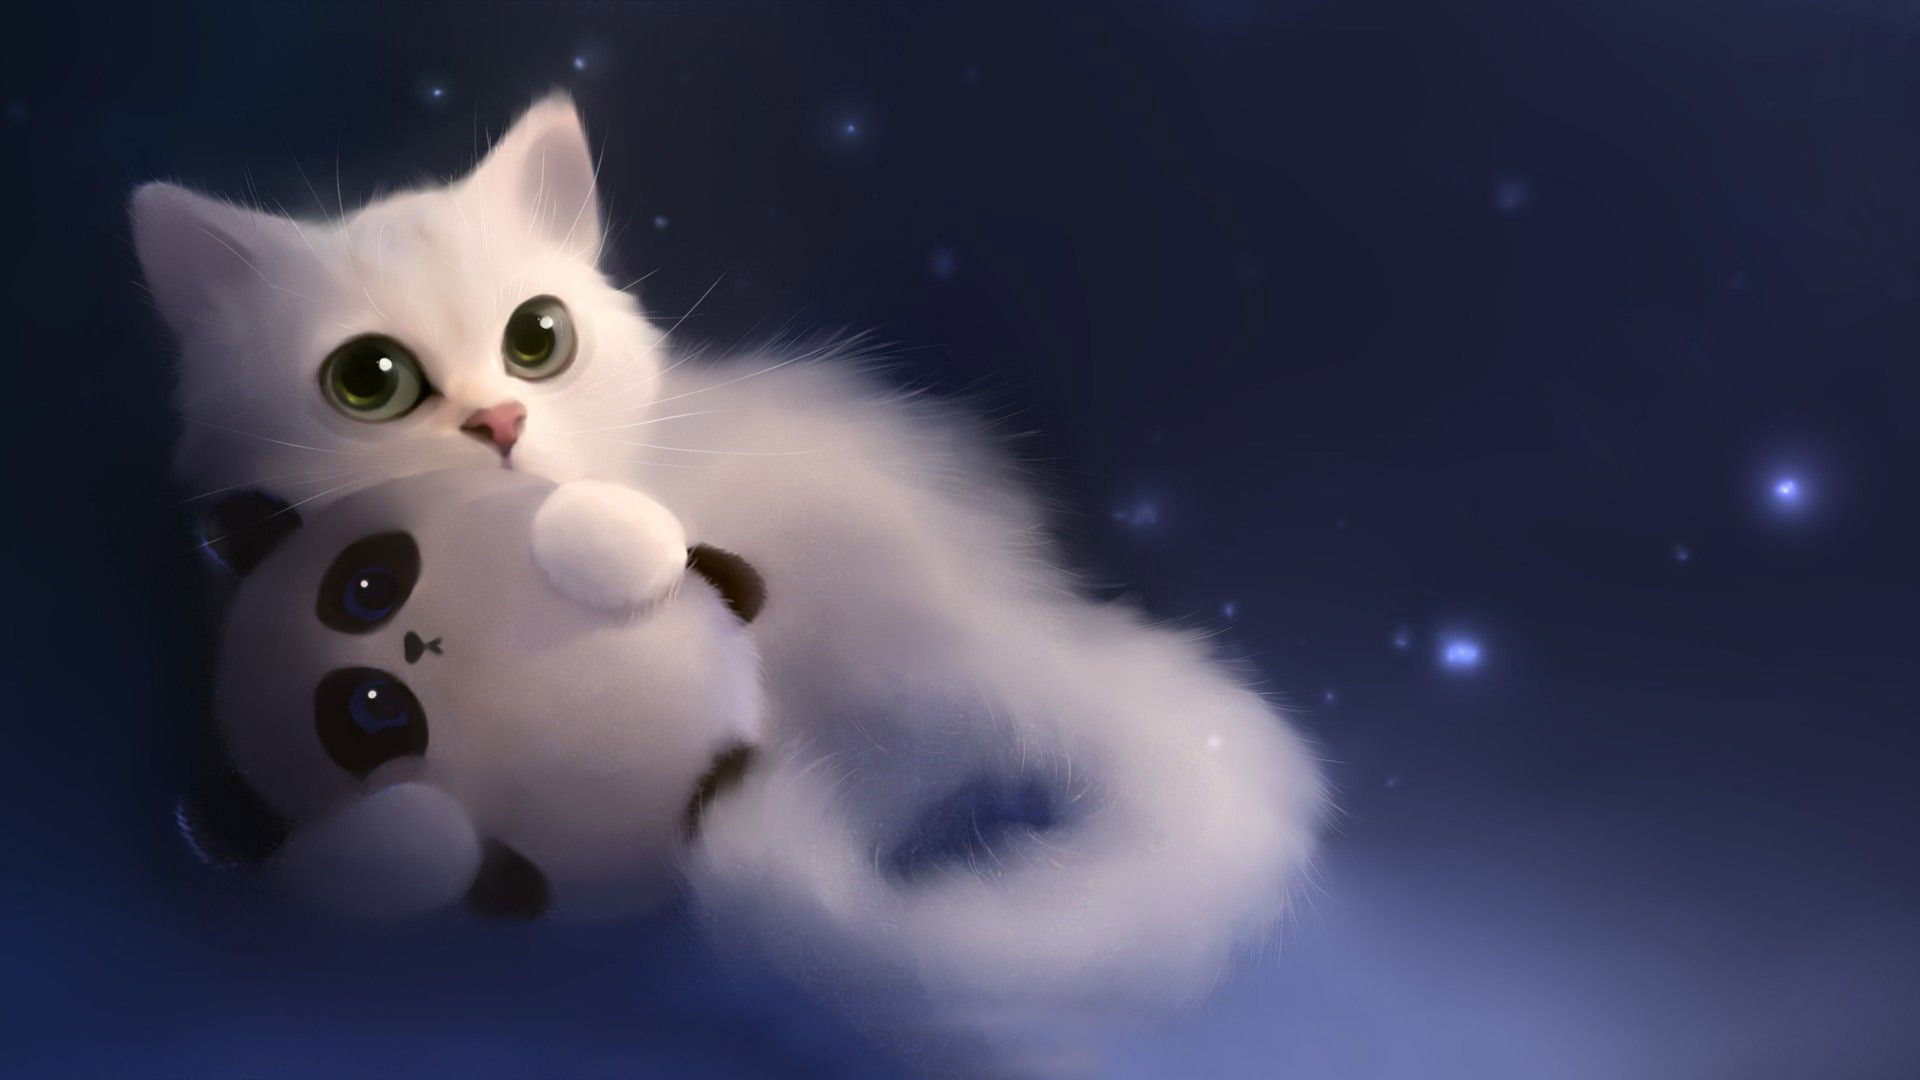 Drawn wallpaper cute anime cat : Resolution Phone Wallpaper Drawing